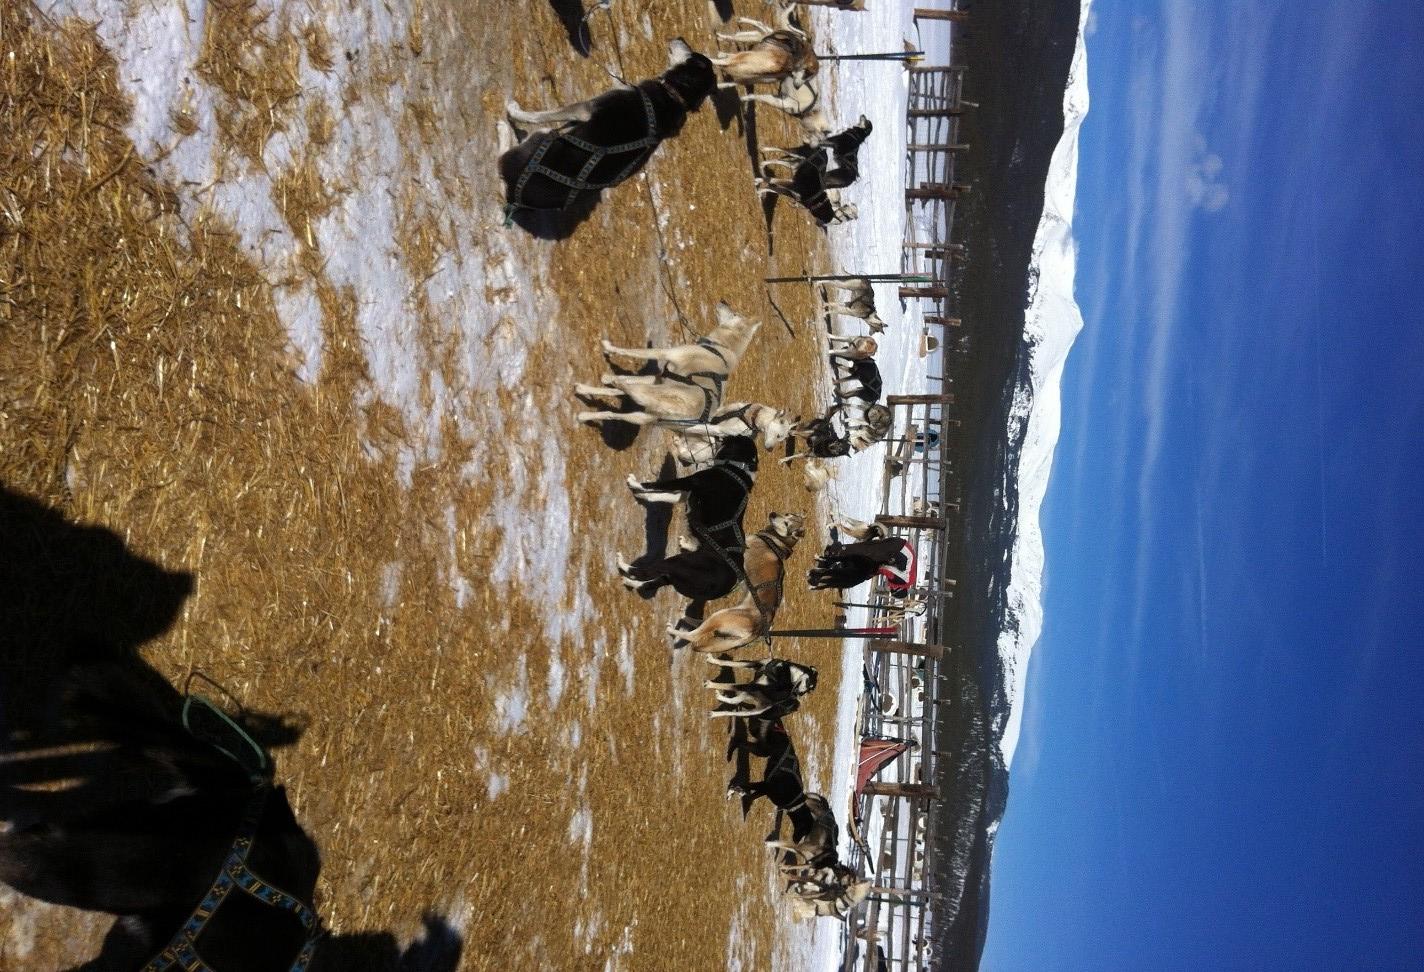 Dogsledding at the base of Mt. Massive